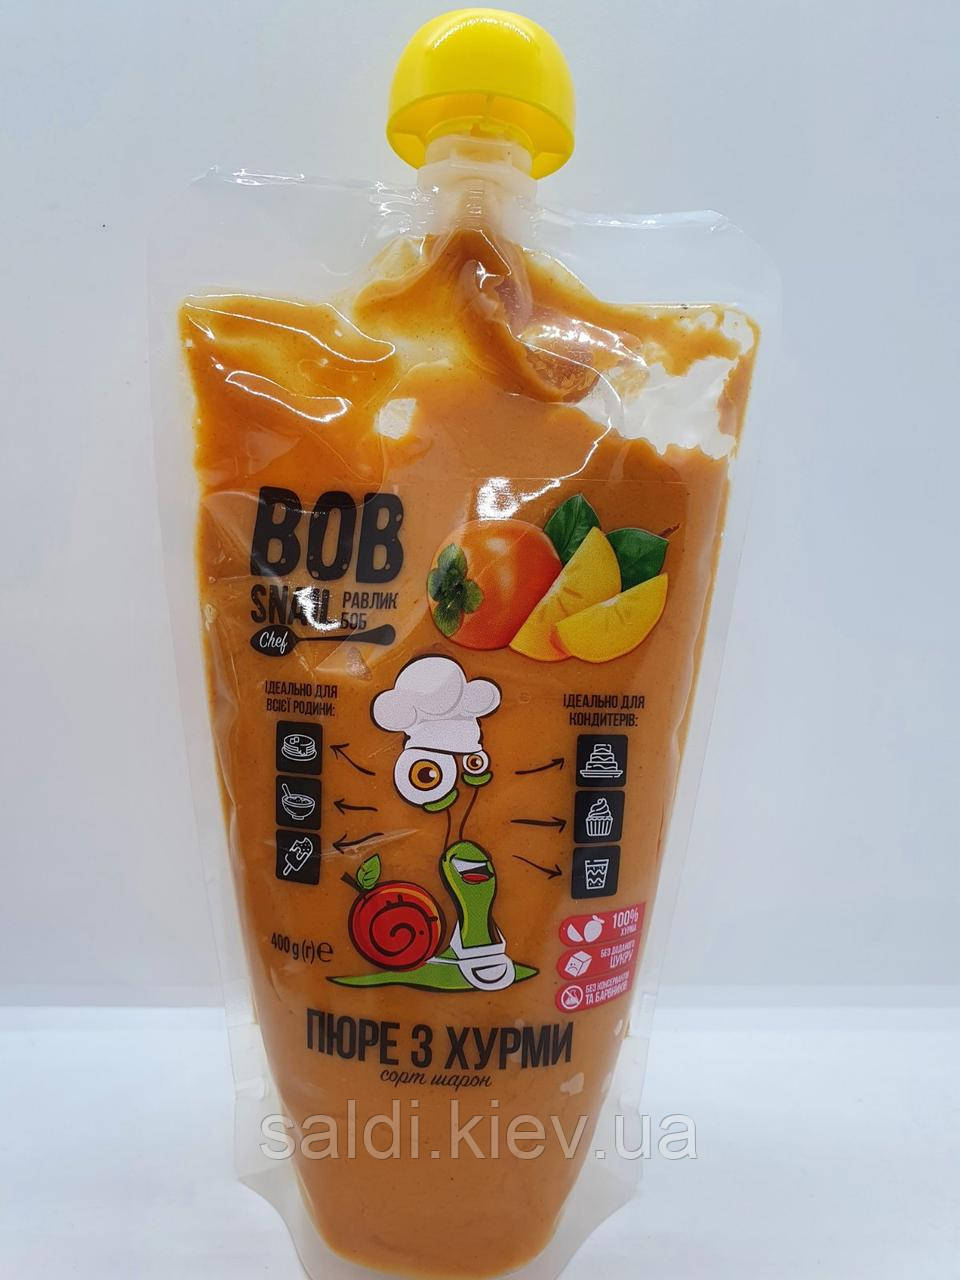 Пюре из Хурмы без сахара Bob Snail (400 грамм)